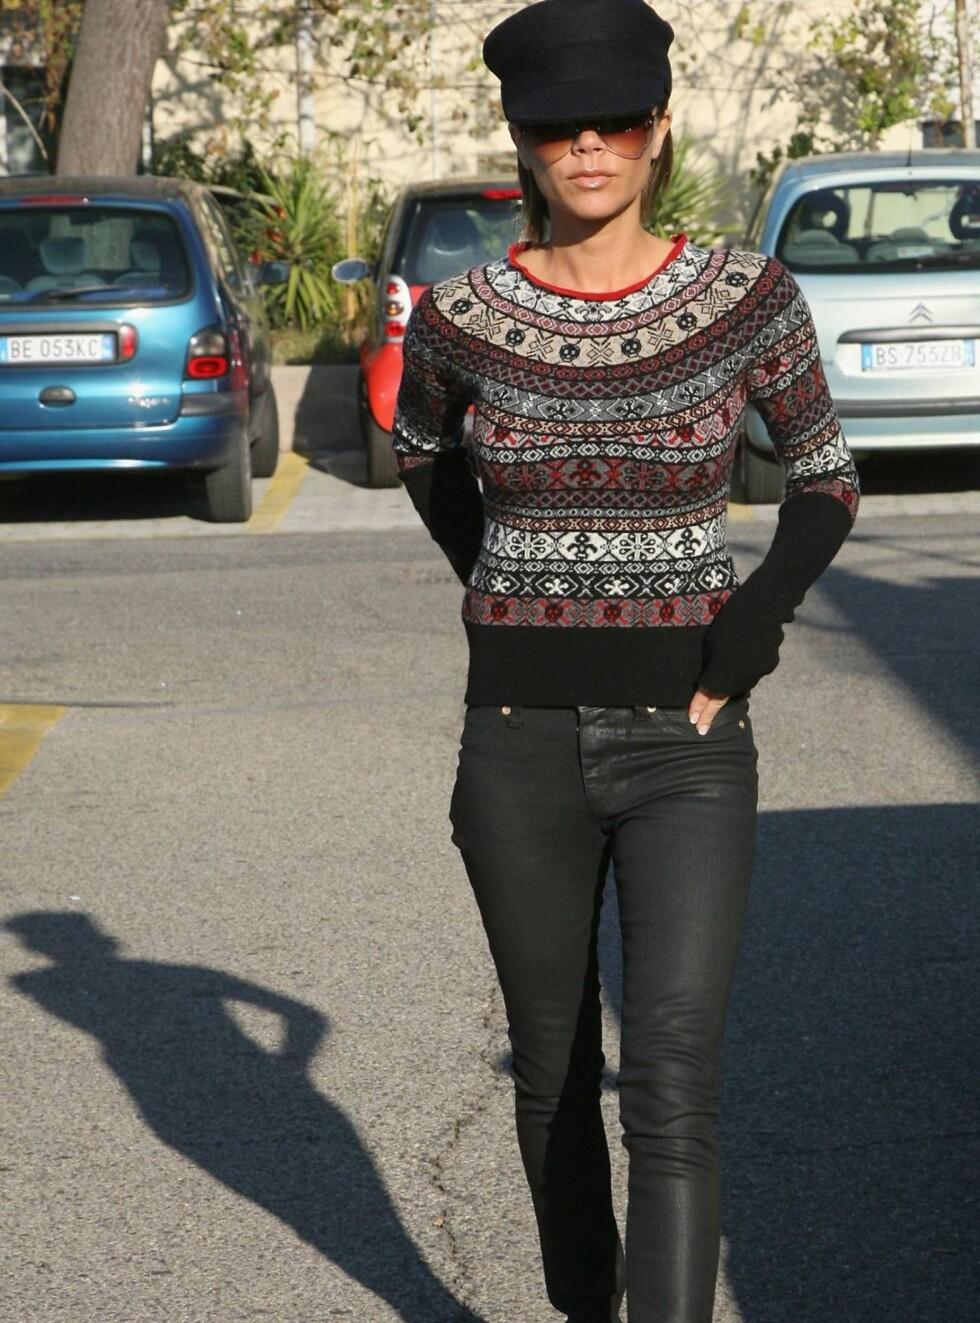 MAGER: Victoria Beckhams figur har gitt henne kallenavnet Skeletal Spice. Foto: All Over Press